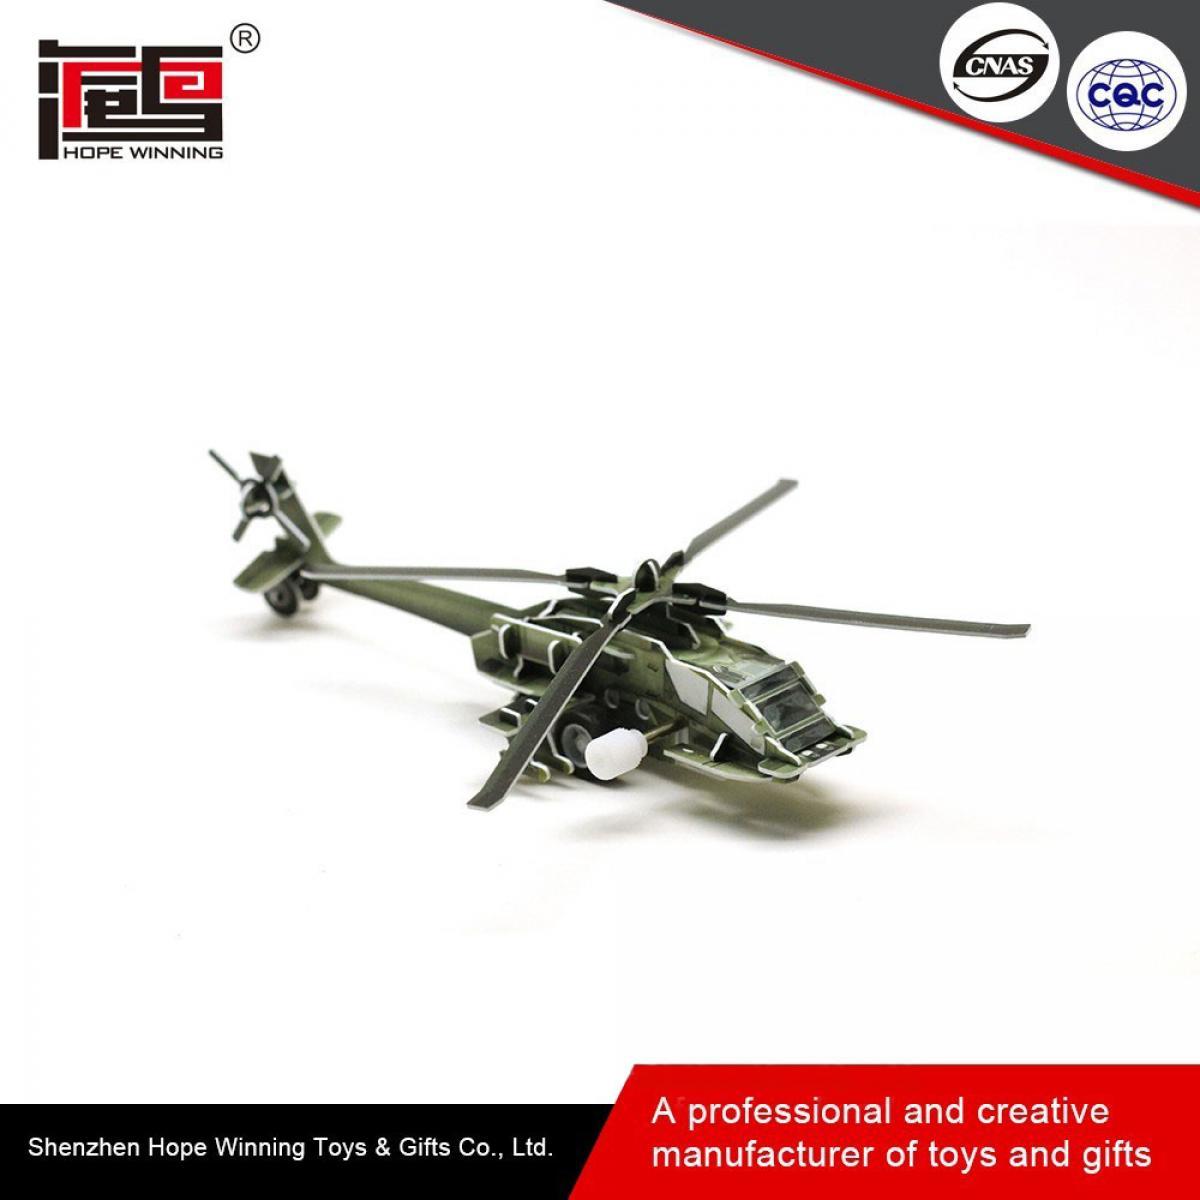 Пазлы: мультяшный вертолет